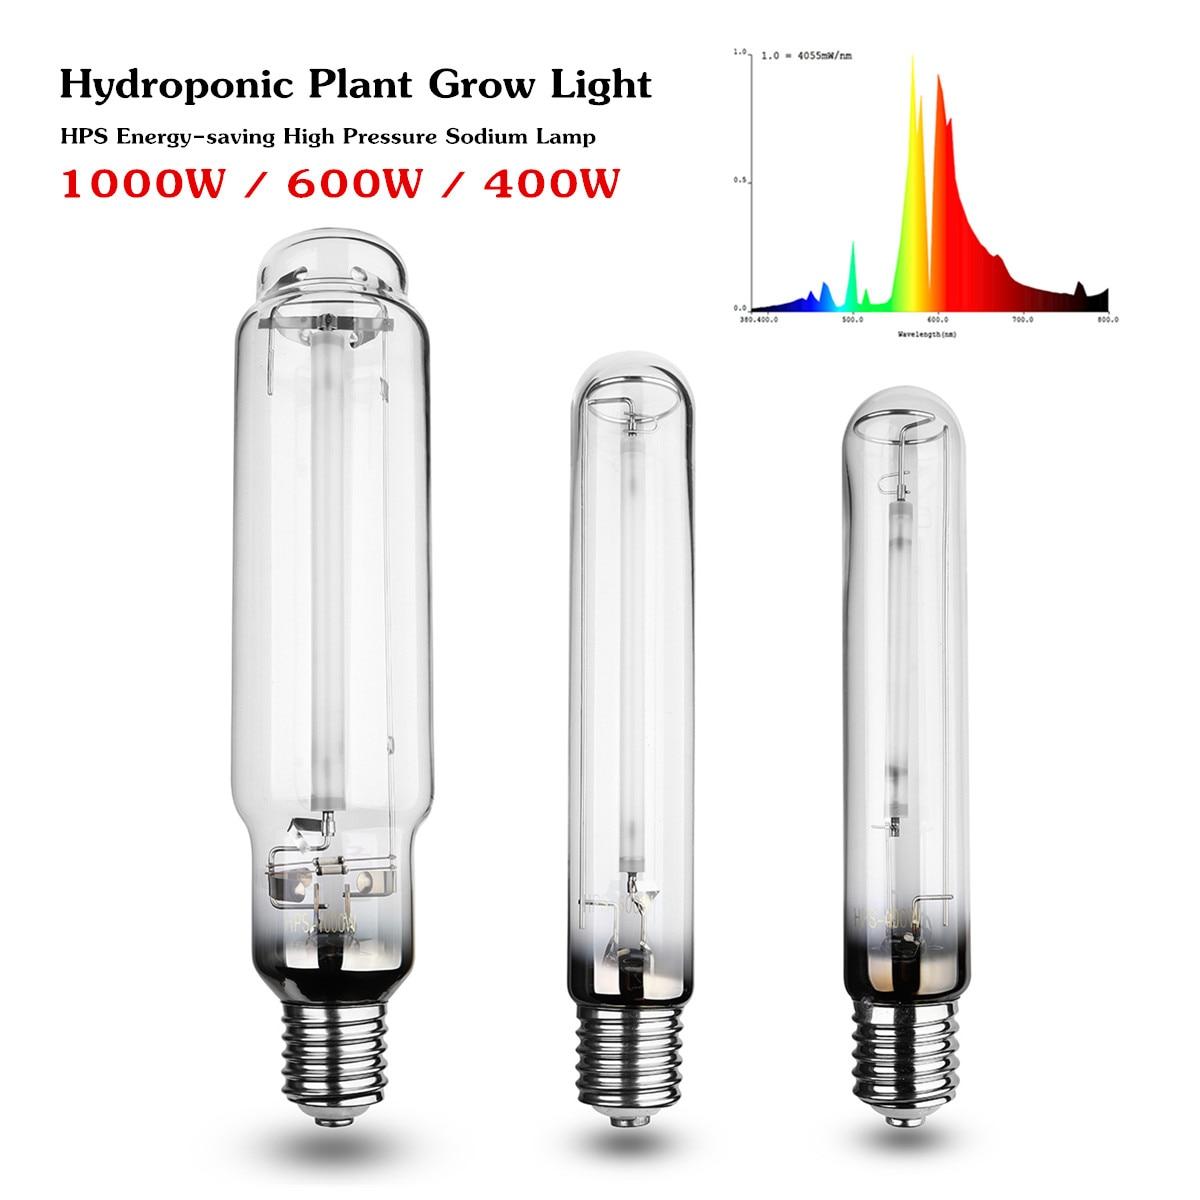 Лампа для выращивания растений E40, 400/600 Вт/1000 Вт, лампа для выращивания натрия, лампа для выращивания растений в помещении, лампа для выращива...